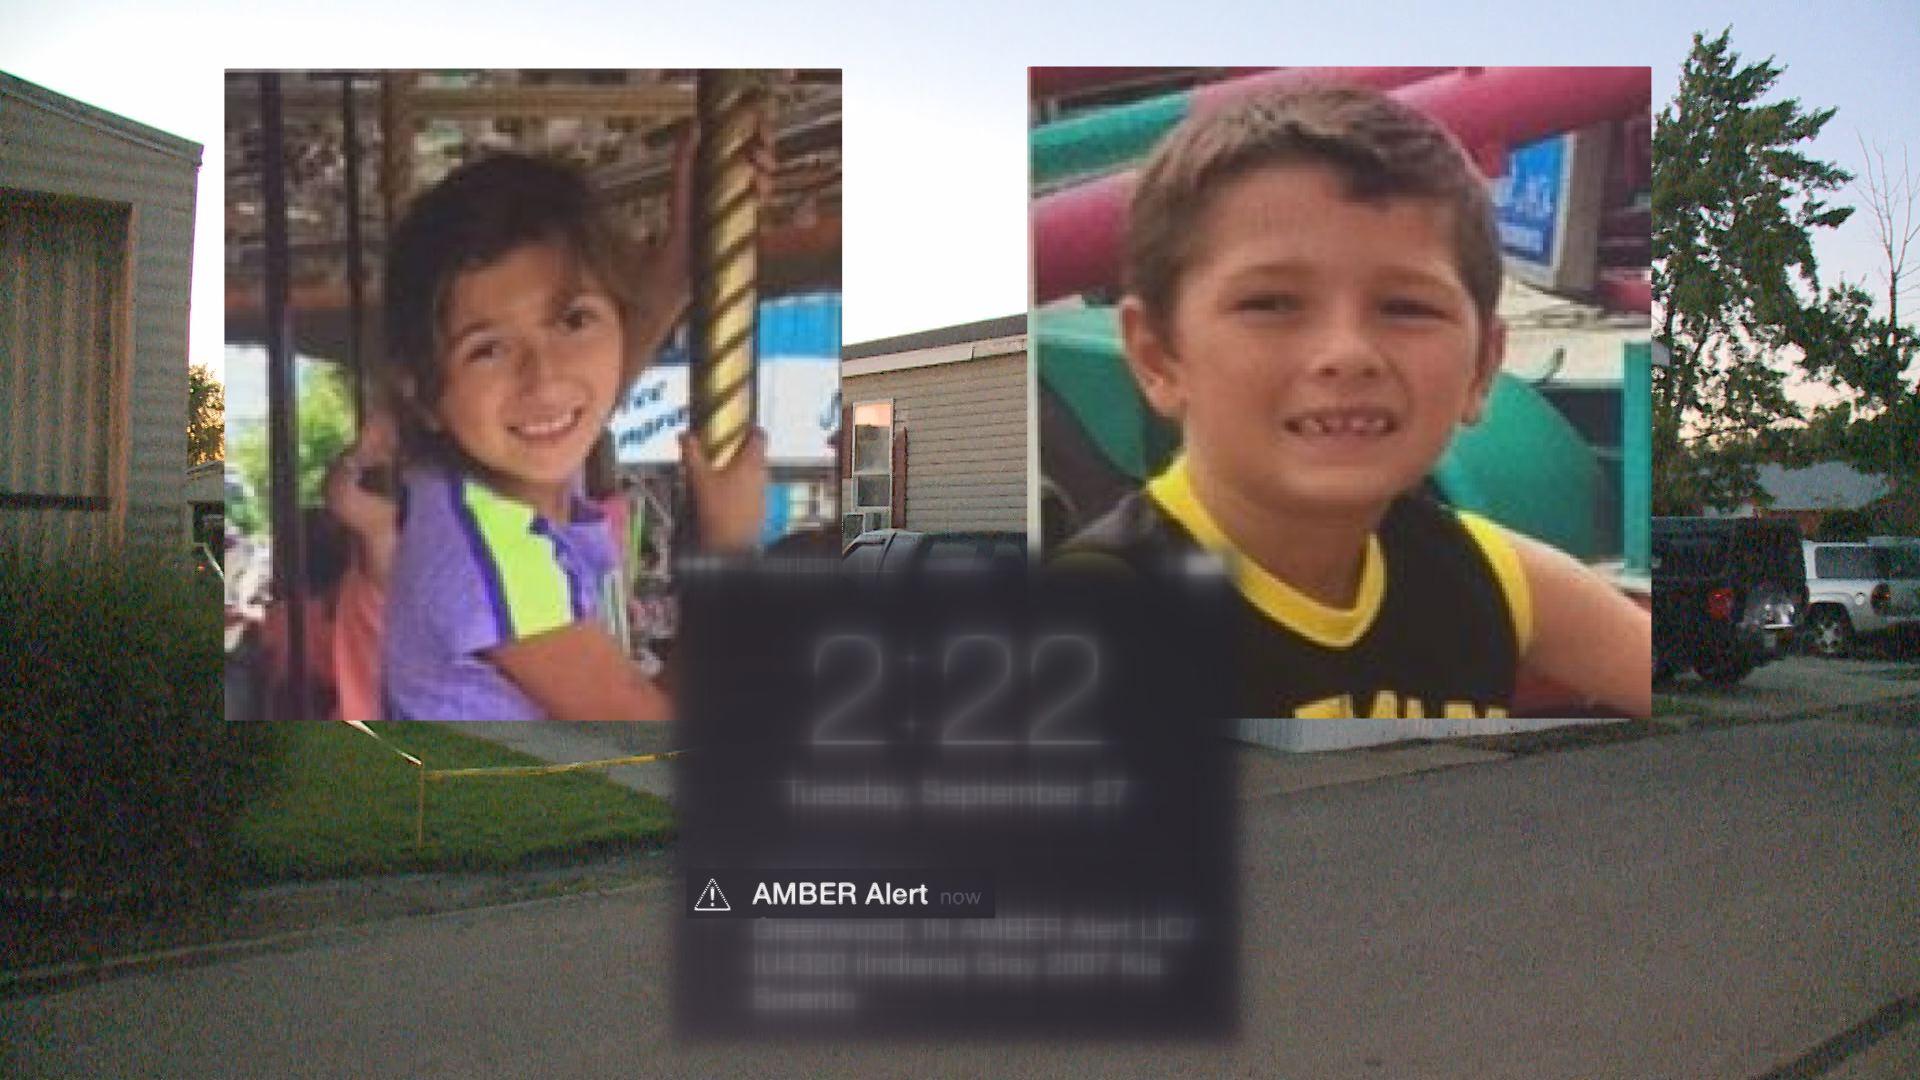 amber-alert-kids-text-pic_210661